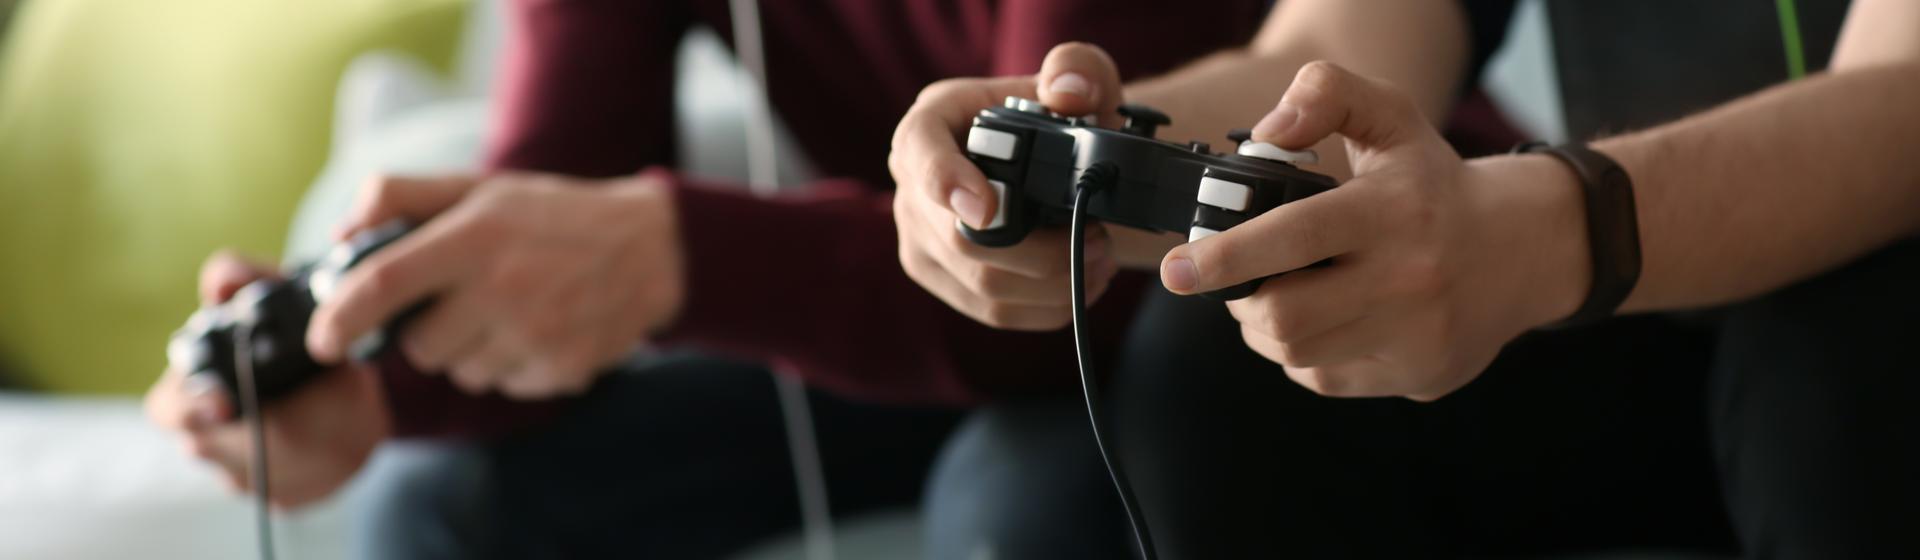 Projeto Passa o Controle doa videogames usados para novas casas